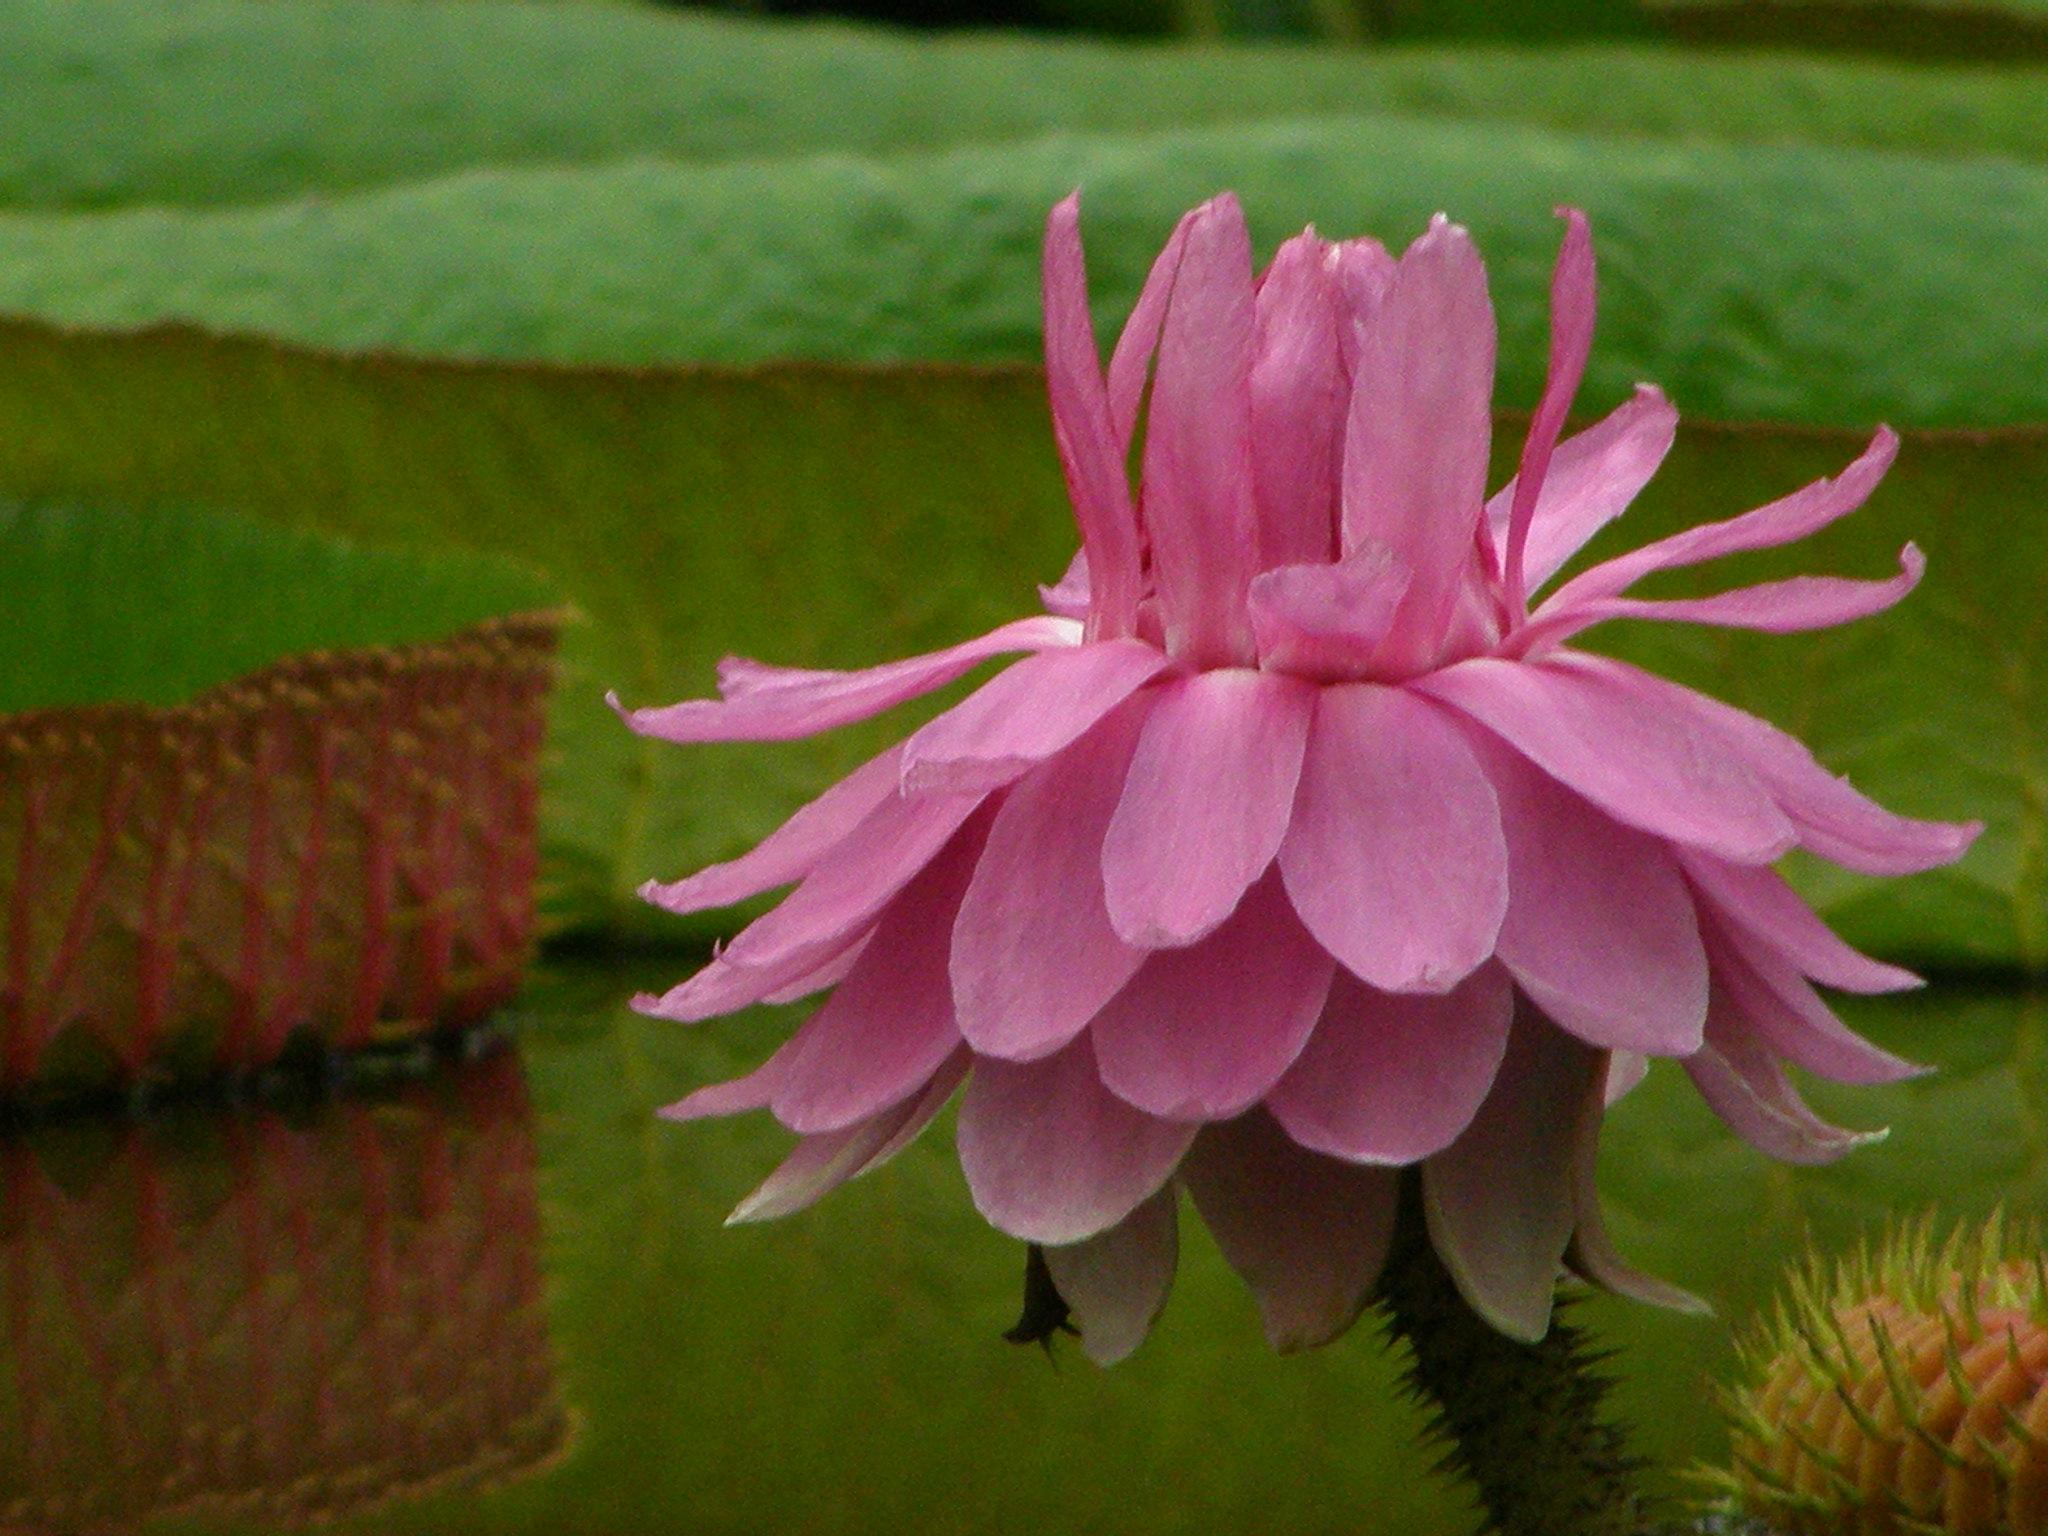 VƯỜN CÂY HOA ĐV I Victoria_amazonica_flower_head